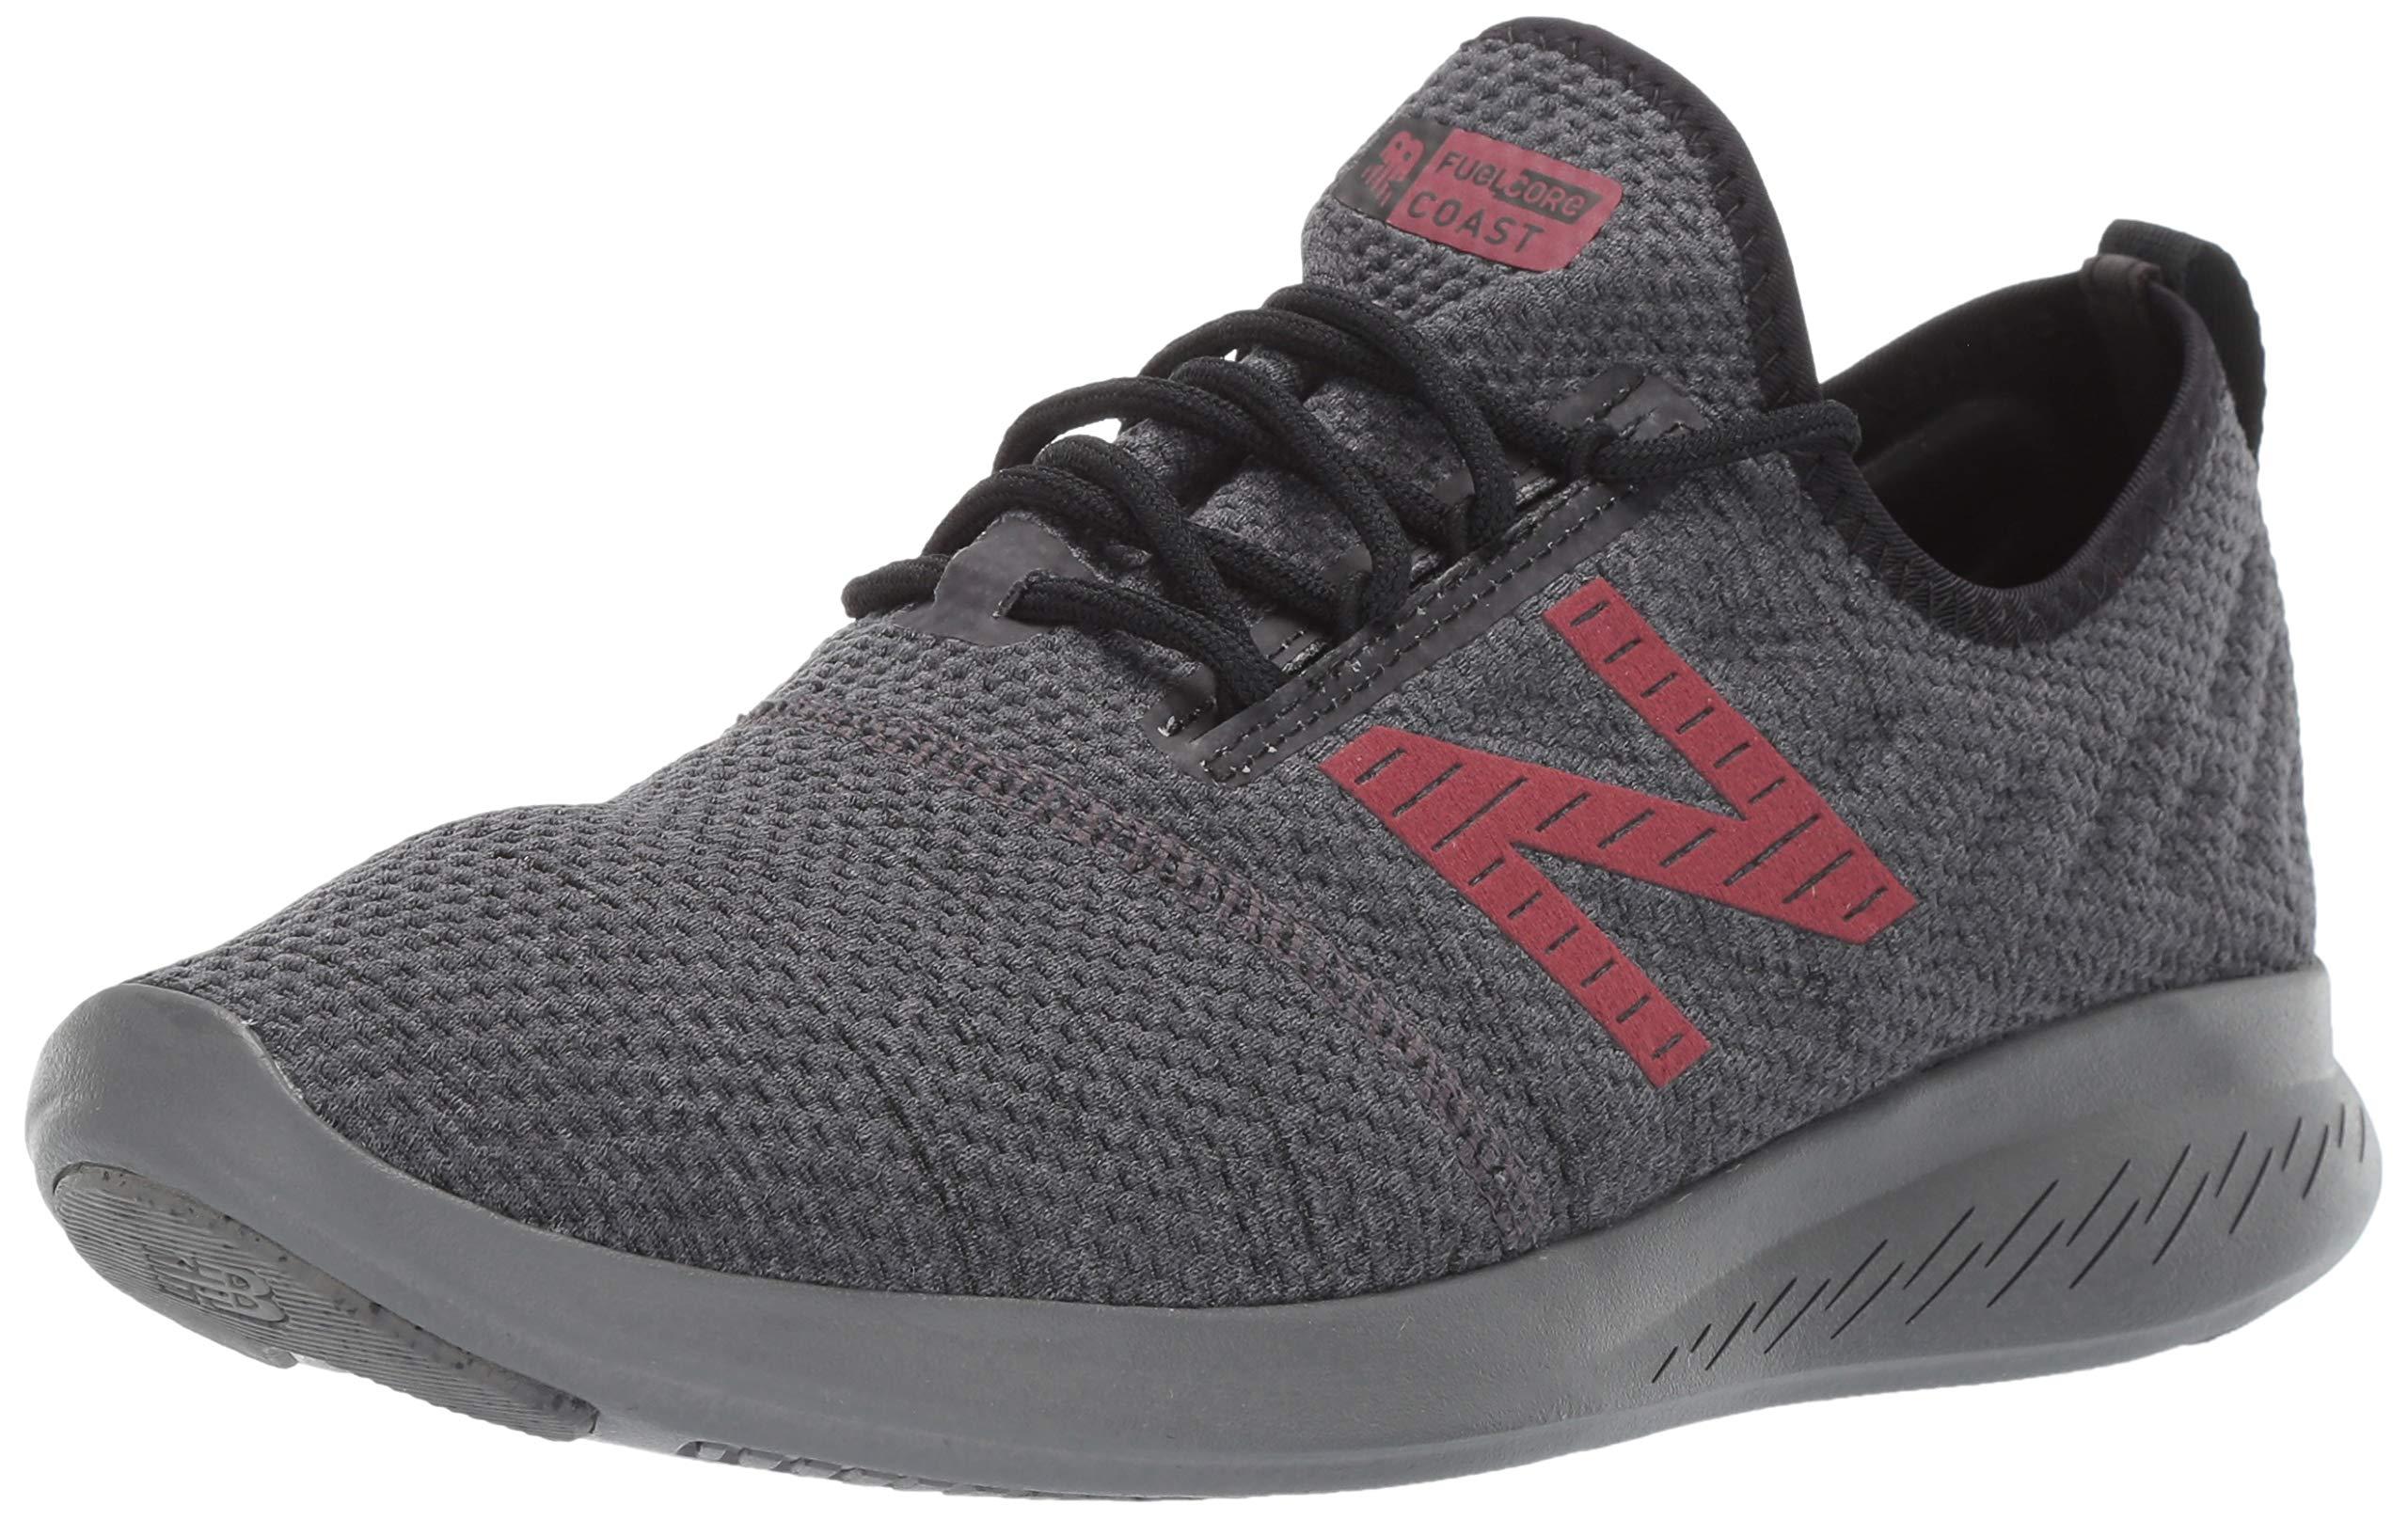 New Balance Men's Coast V4 FuelCore Running Shoe Black/Magnet/Mercury red 7.5 4E US